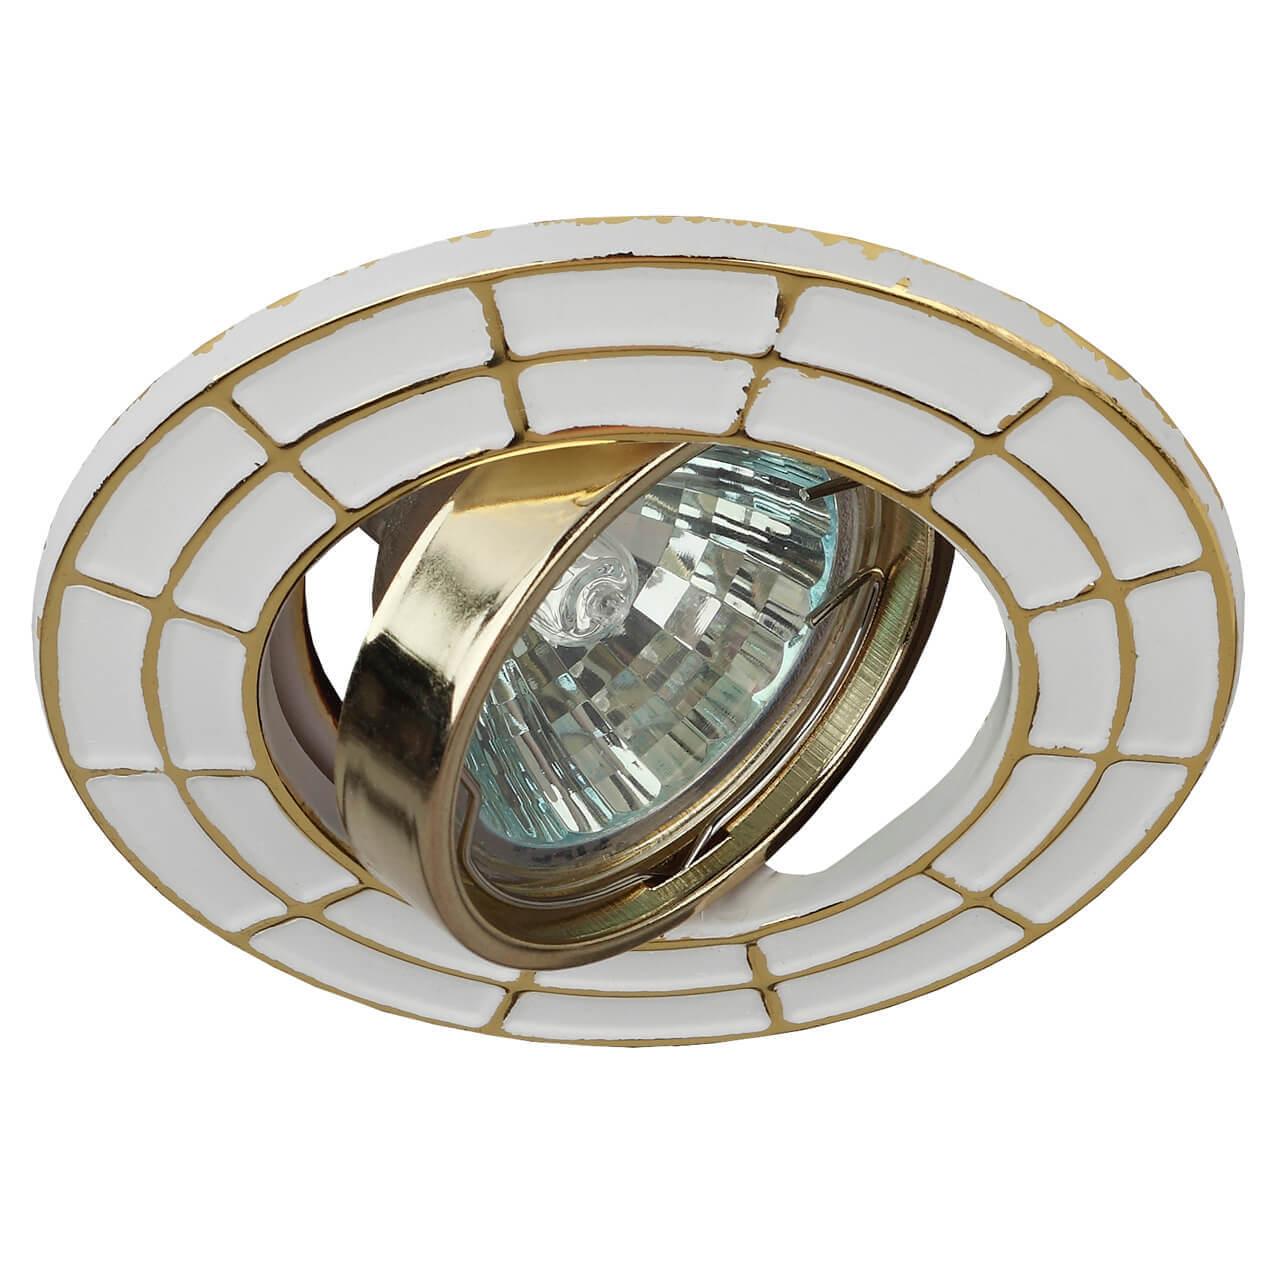 все цены на Встраиваемый светильник ЭРА Штампованный ST7A GD/WH онлайн